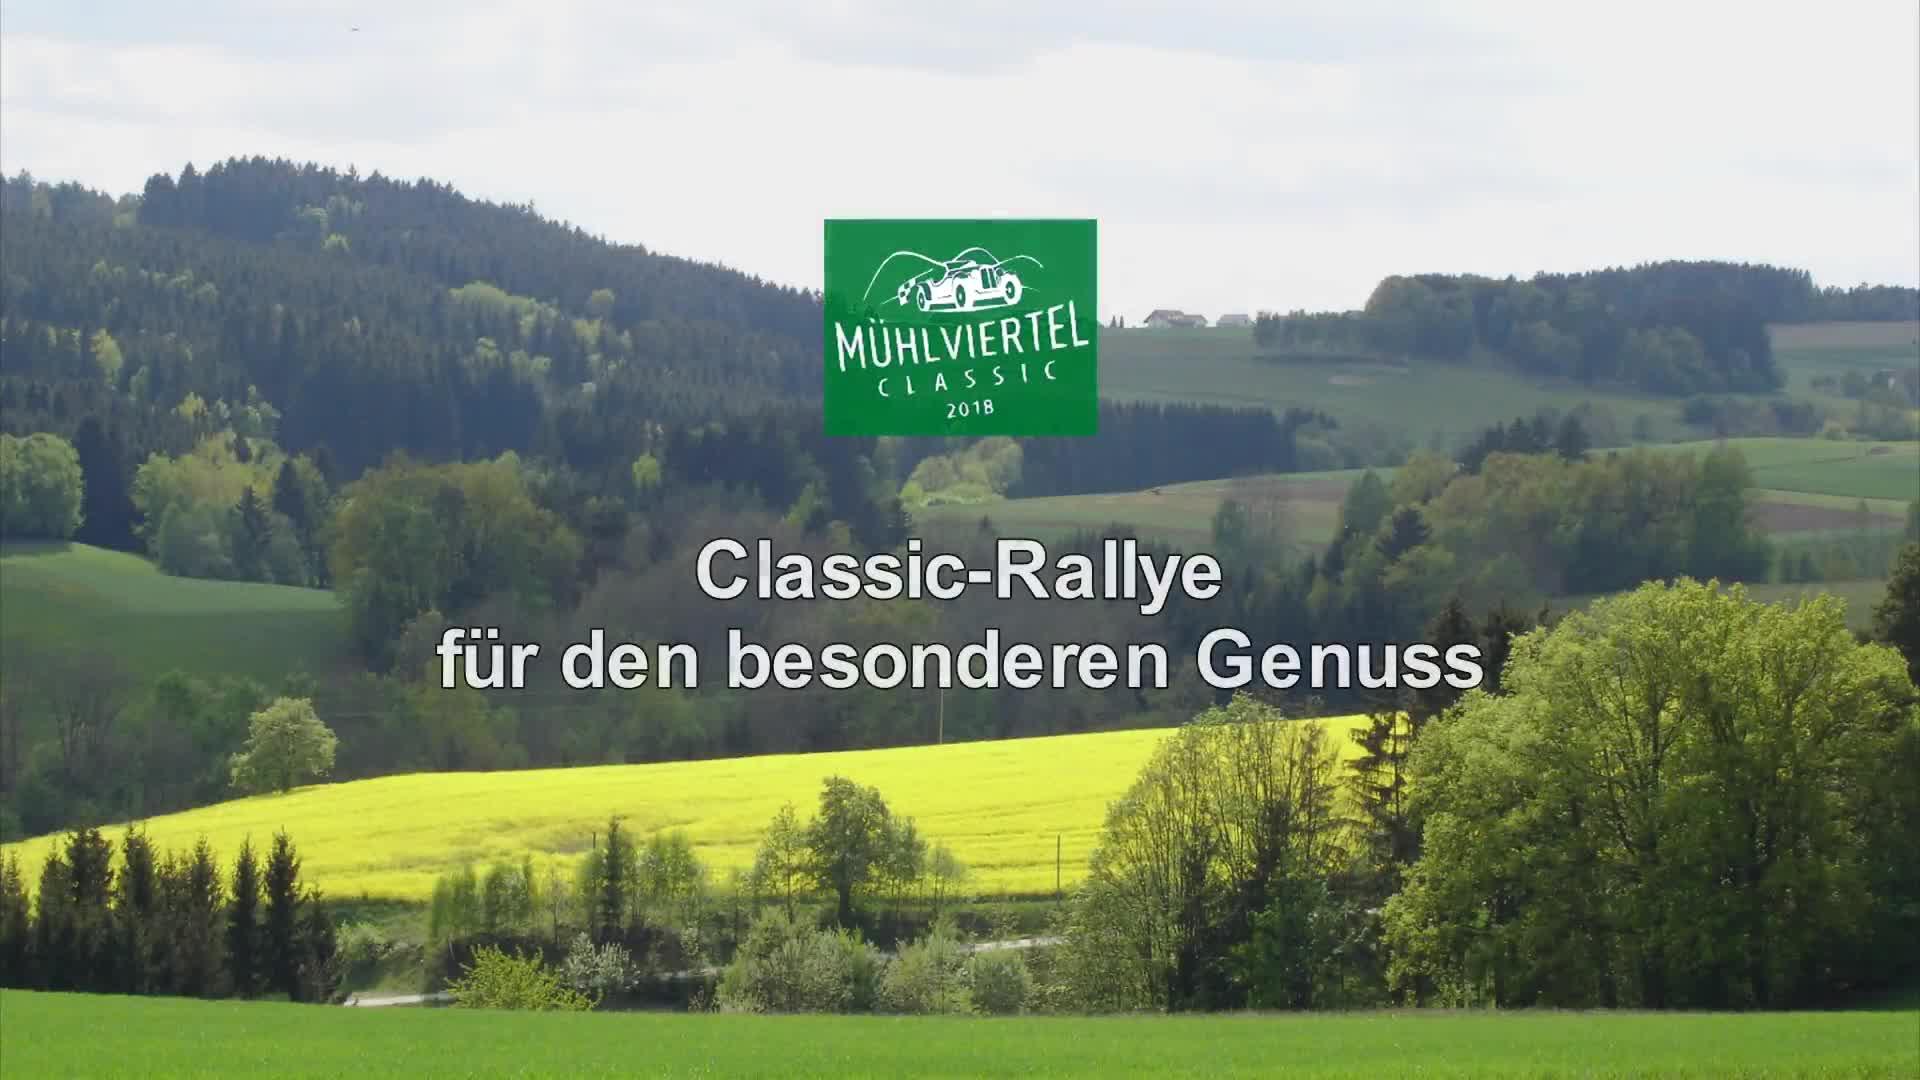 Mühlviertel Classic Rallye 2018